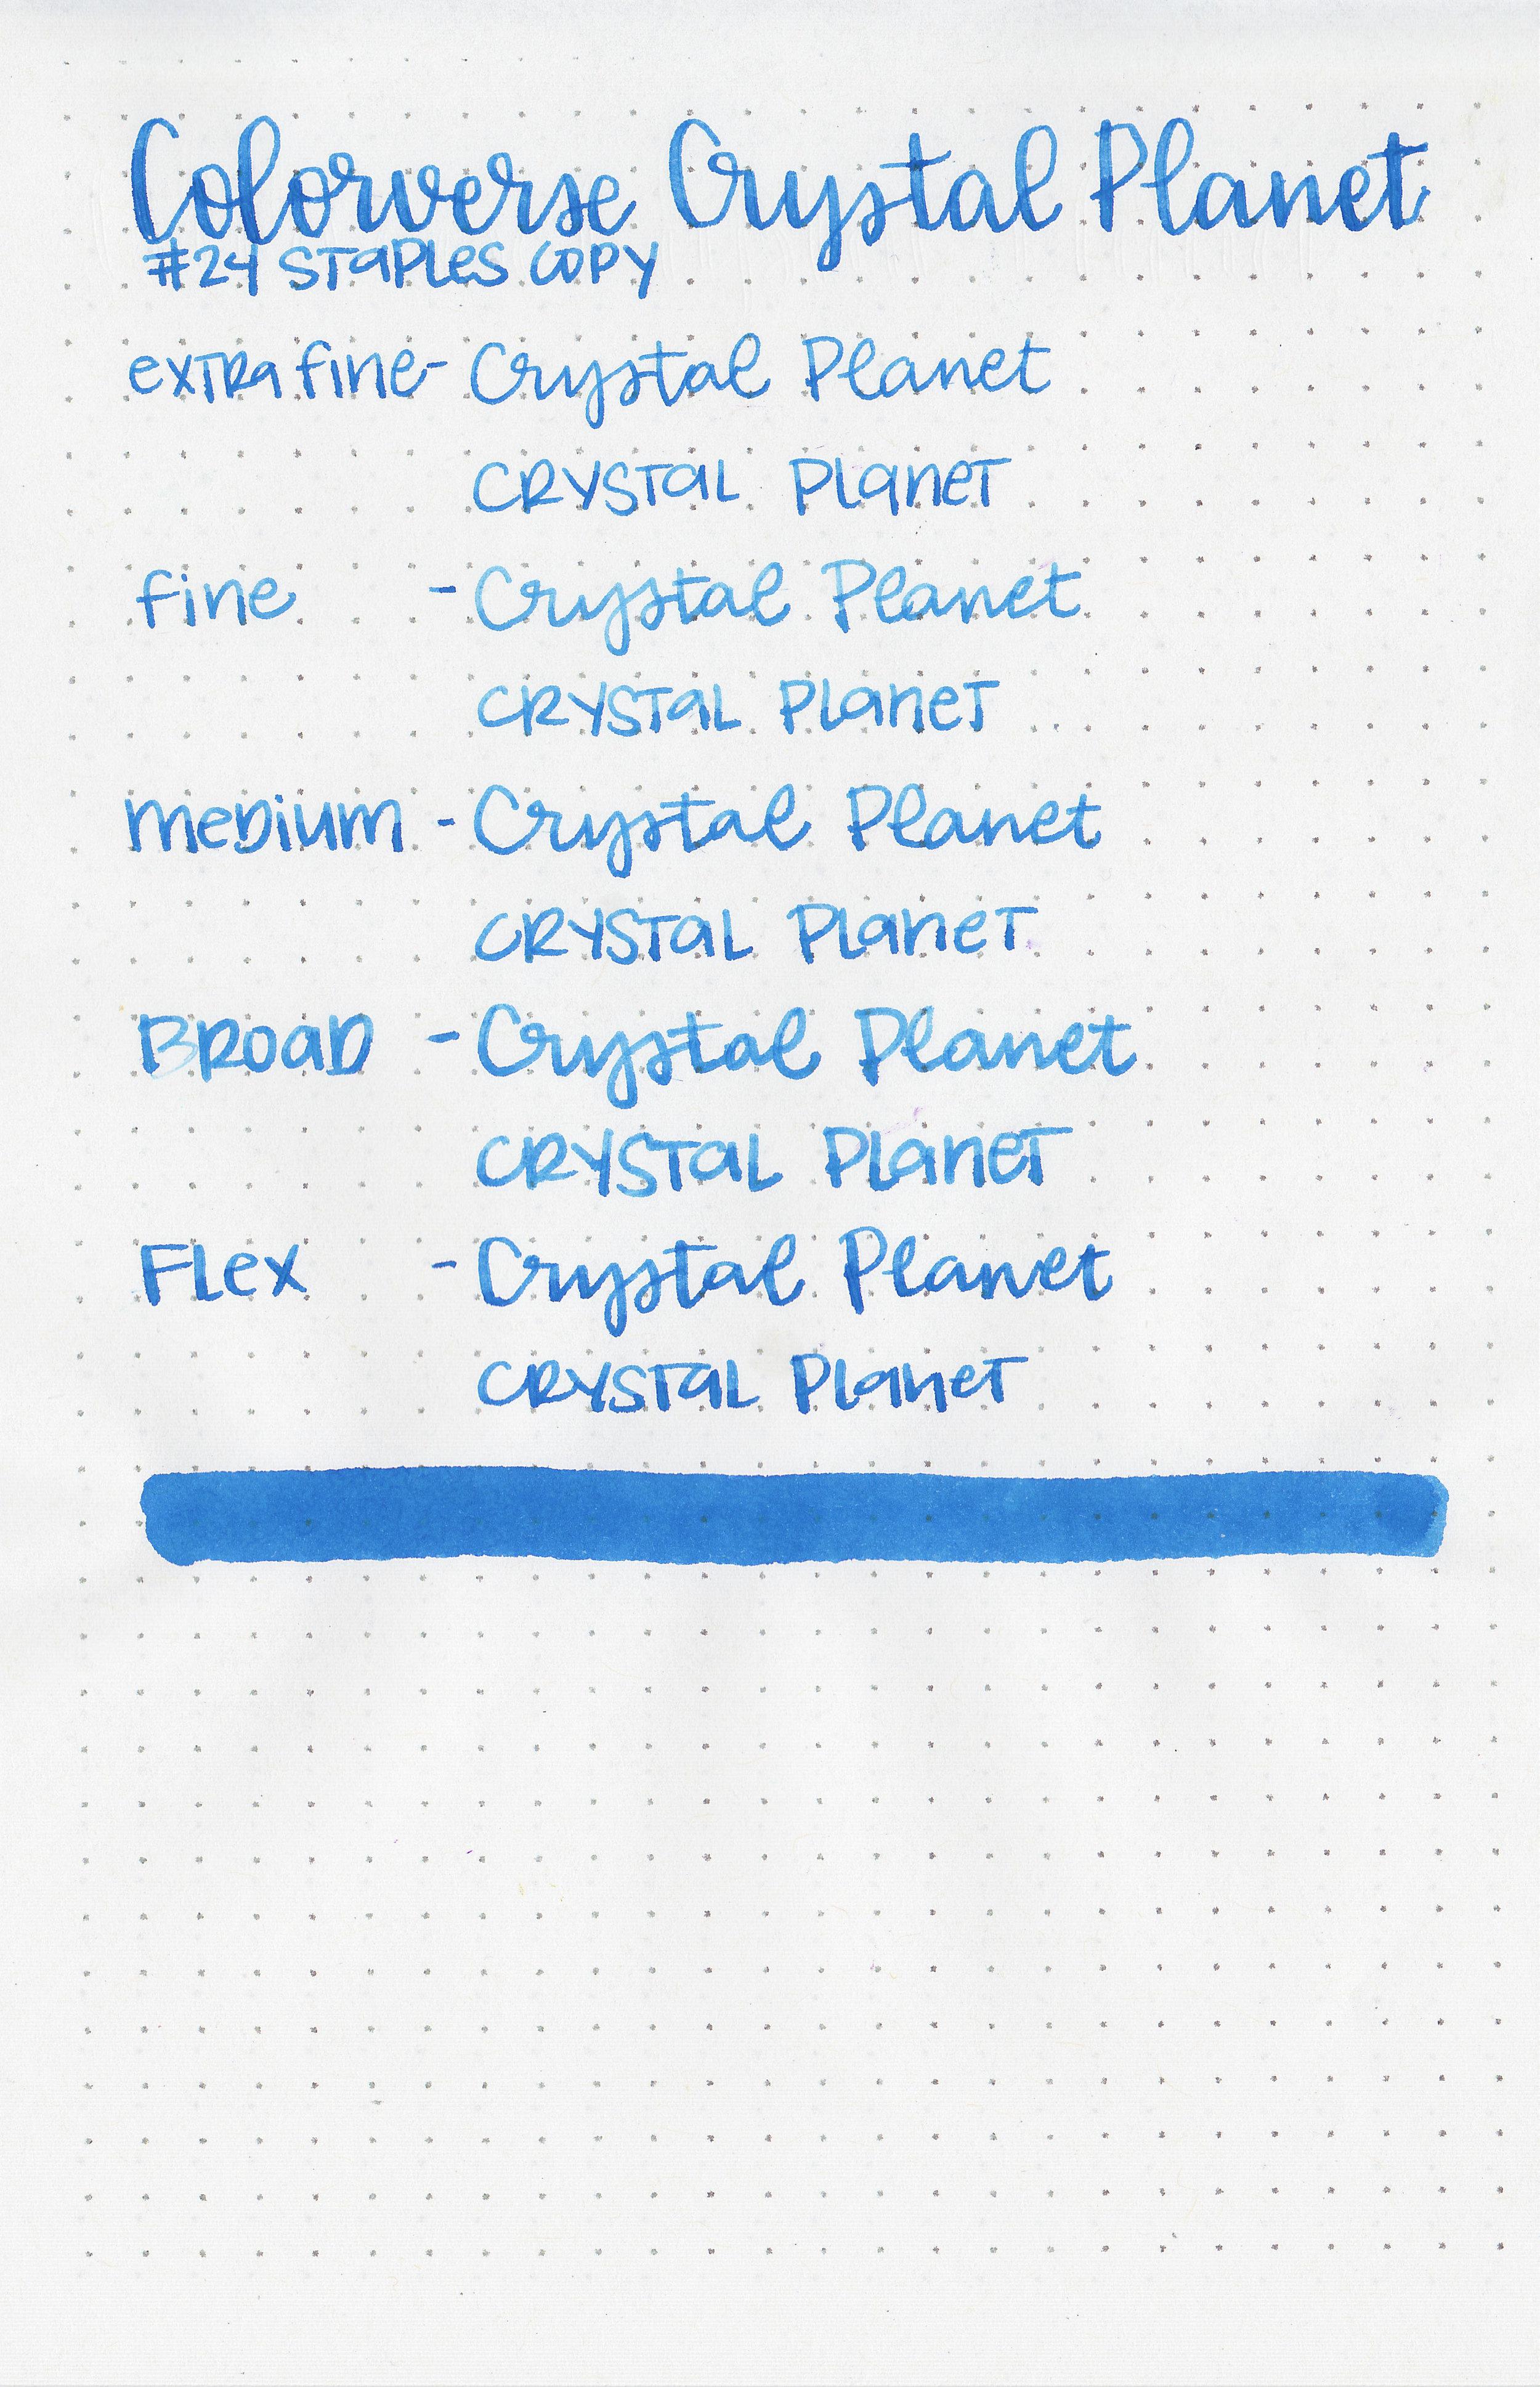 cv-crystal-planet-11.jpg